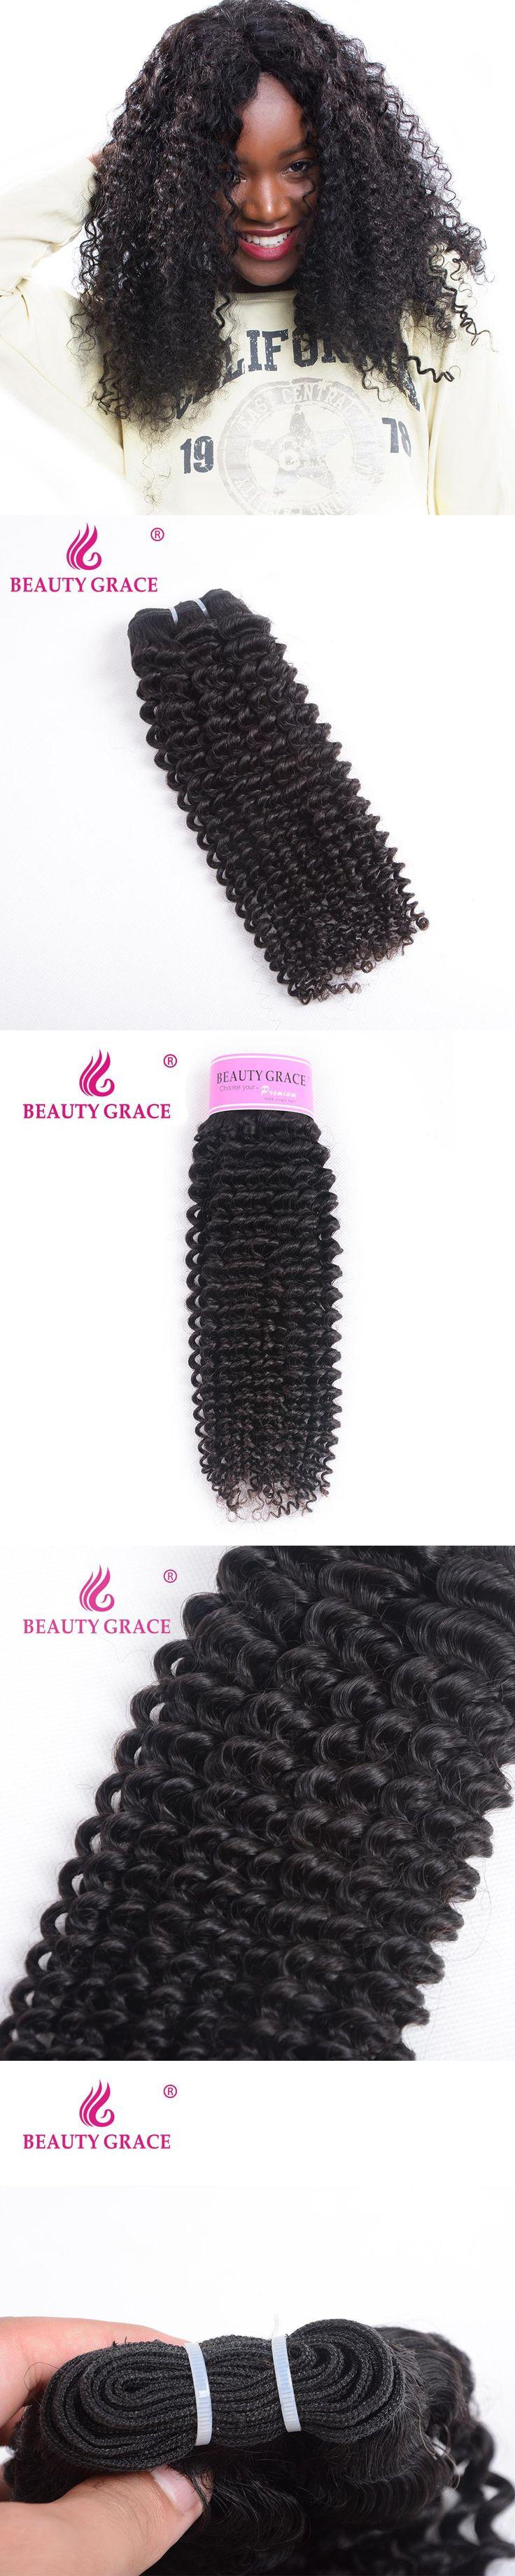 Beauty Grace Brazilian Virgin Hair Kinky Curly Weave Human Hair Bundles 1 Piece Natural Color 12-22 Inch